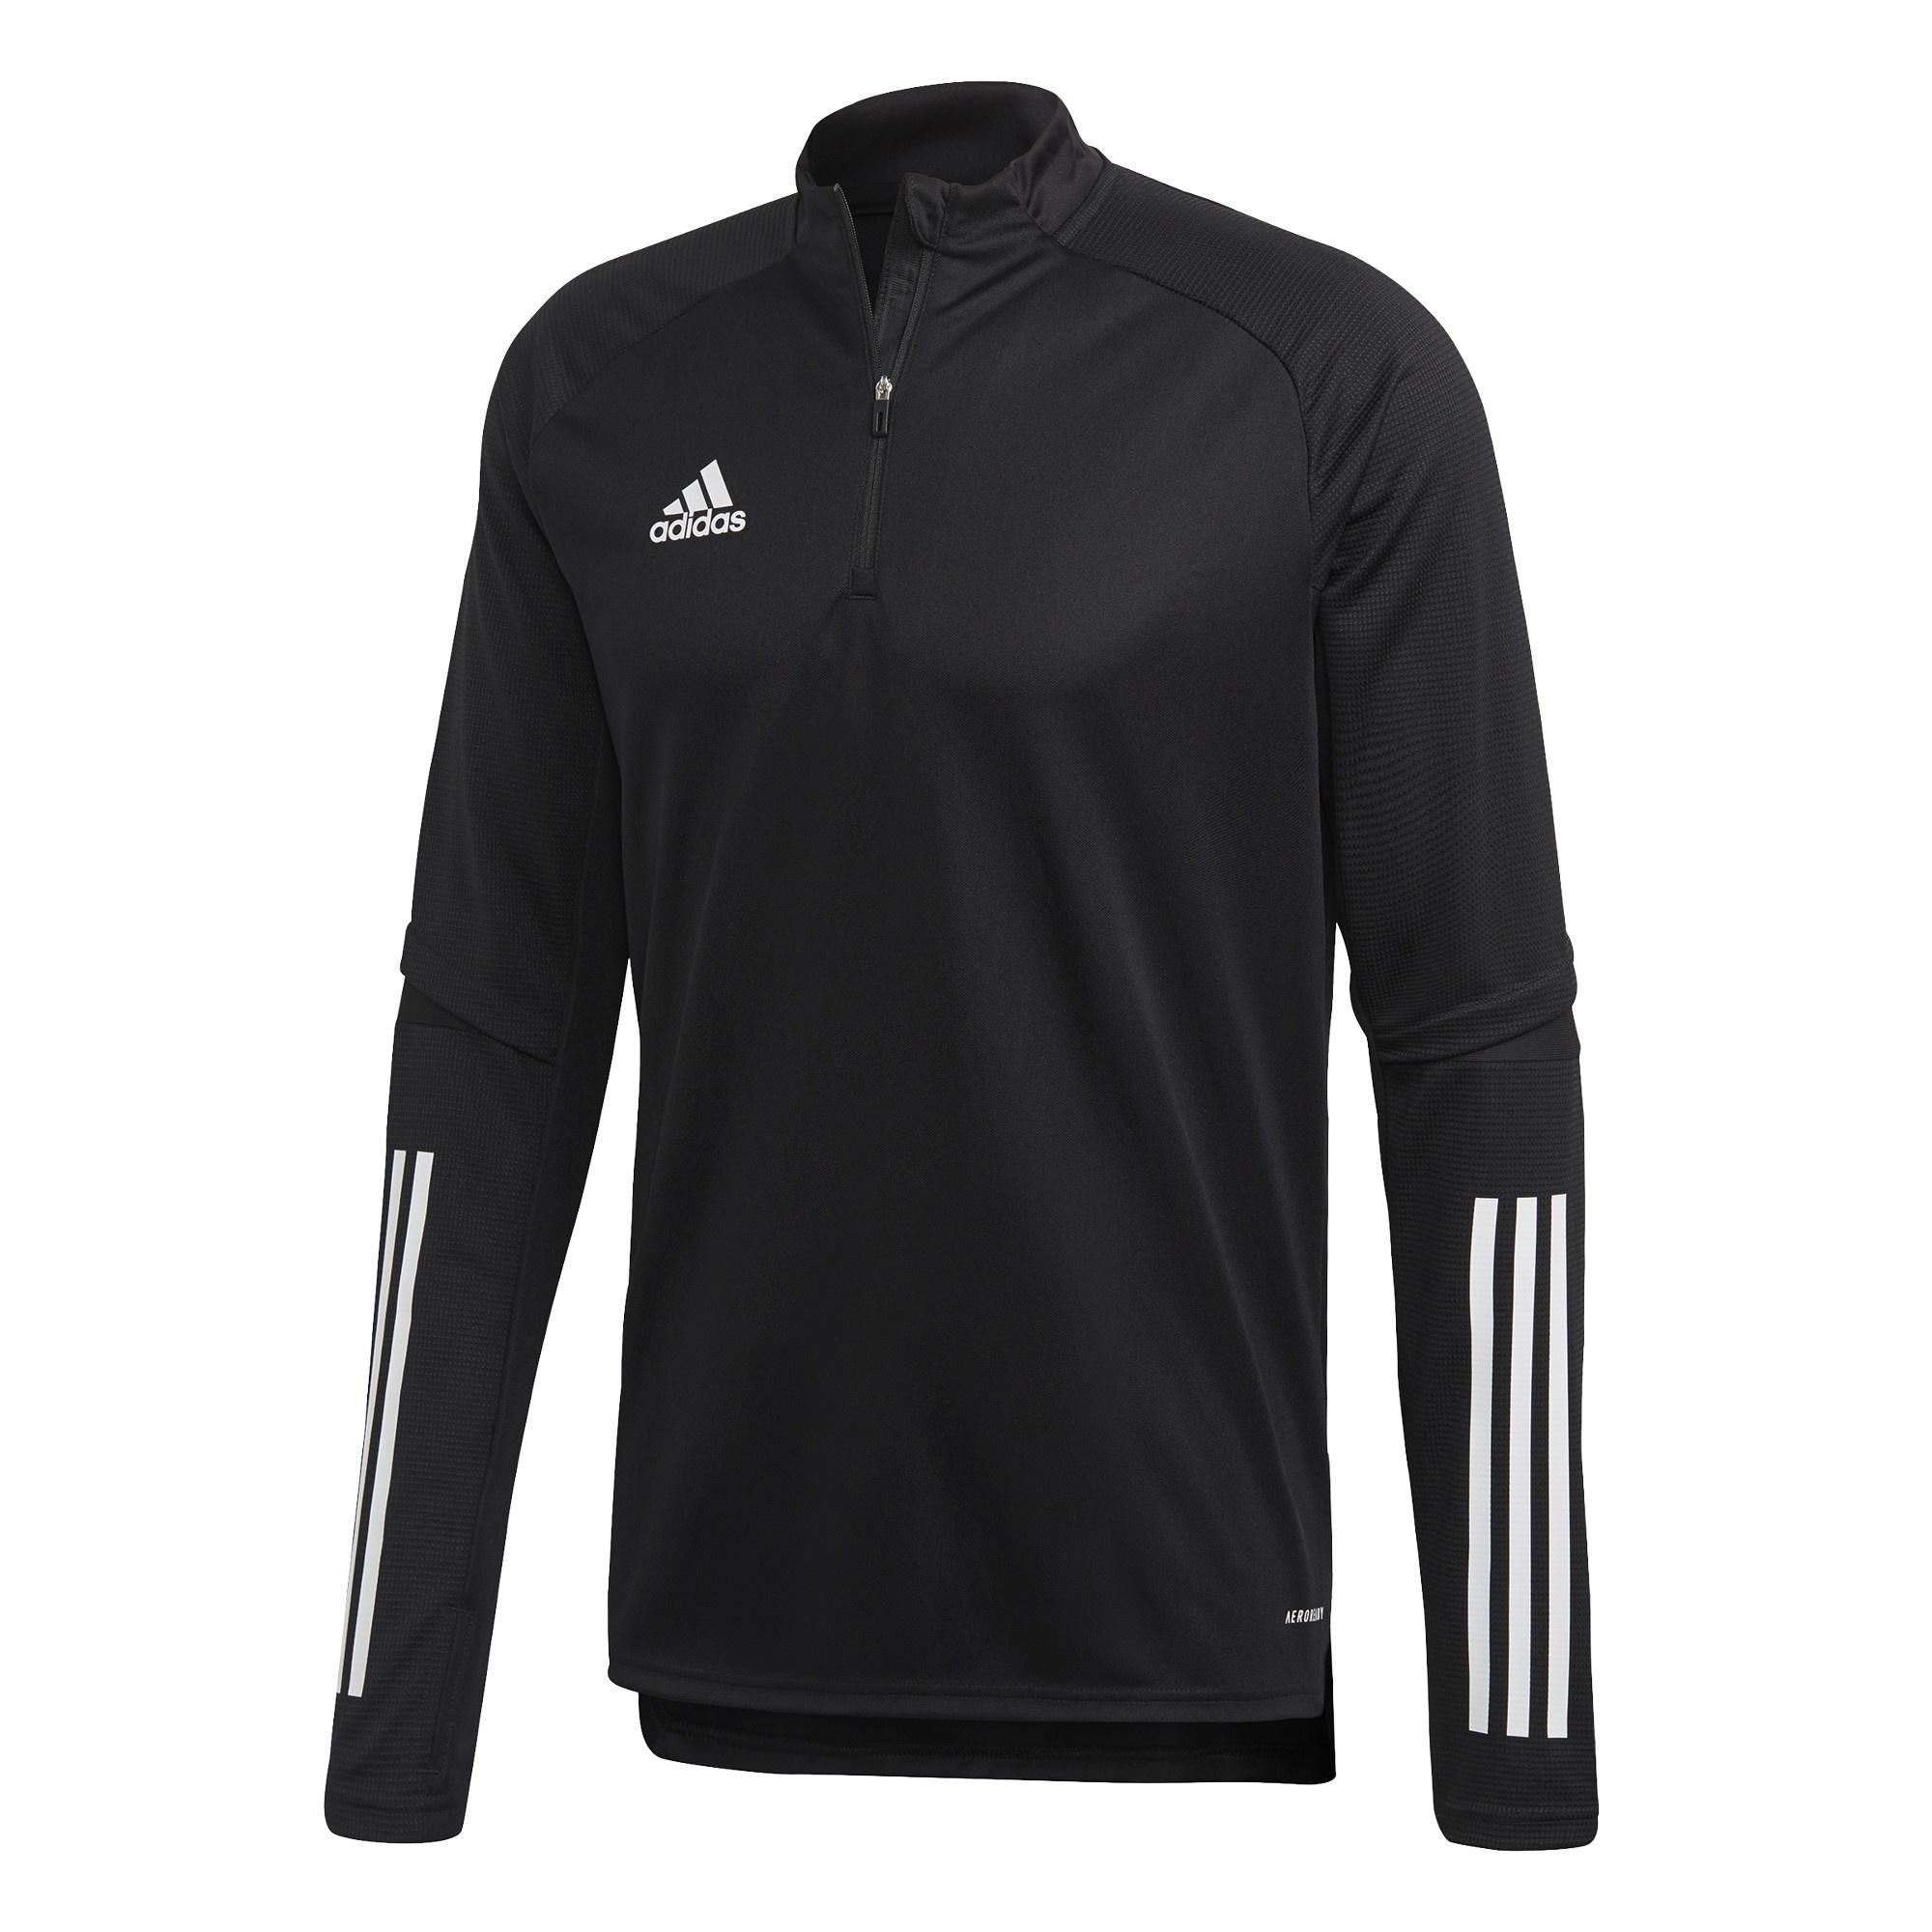 Adidas ADIDAS Condivo Training Top